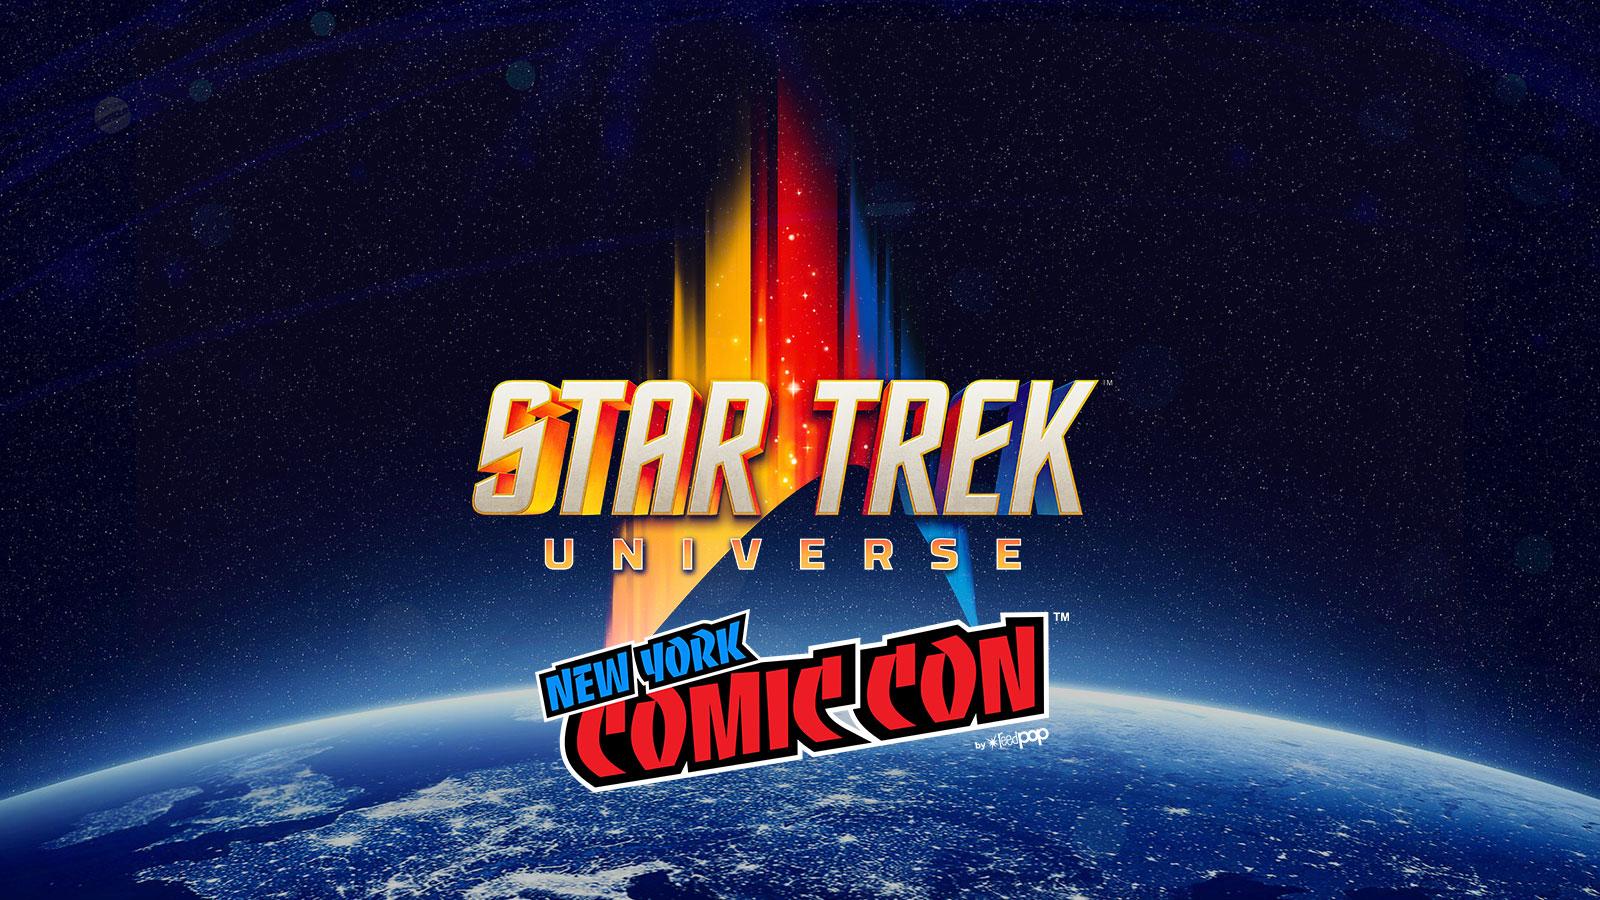 STAR TREK UNIVERSE Programming Set For NYCC Virtual Event